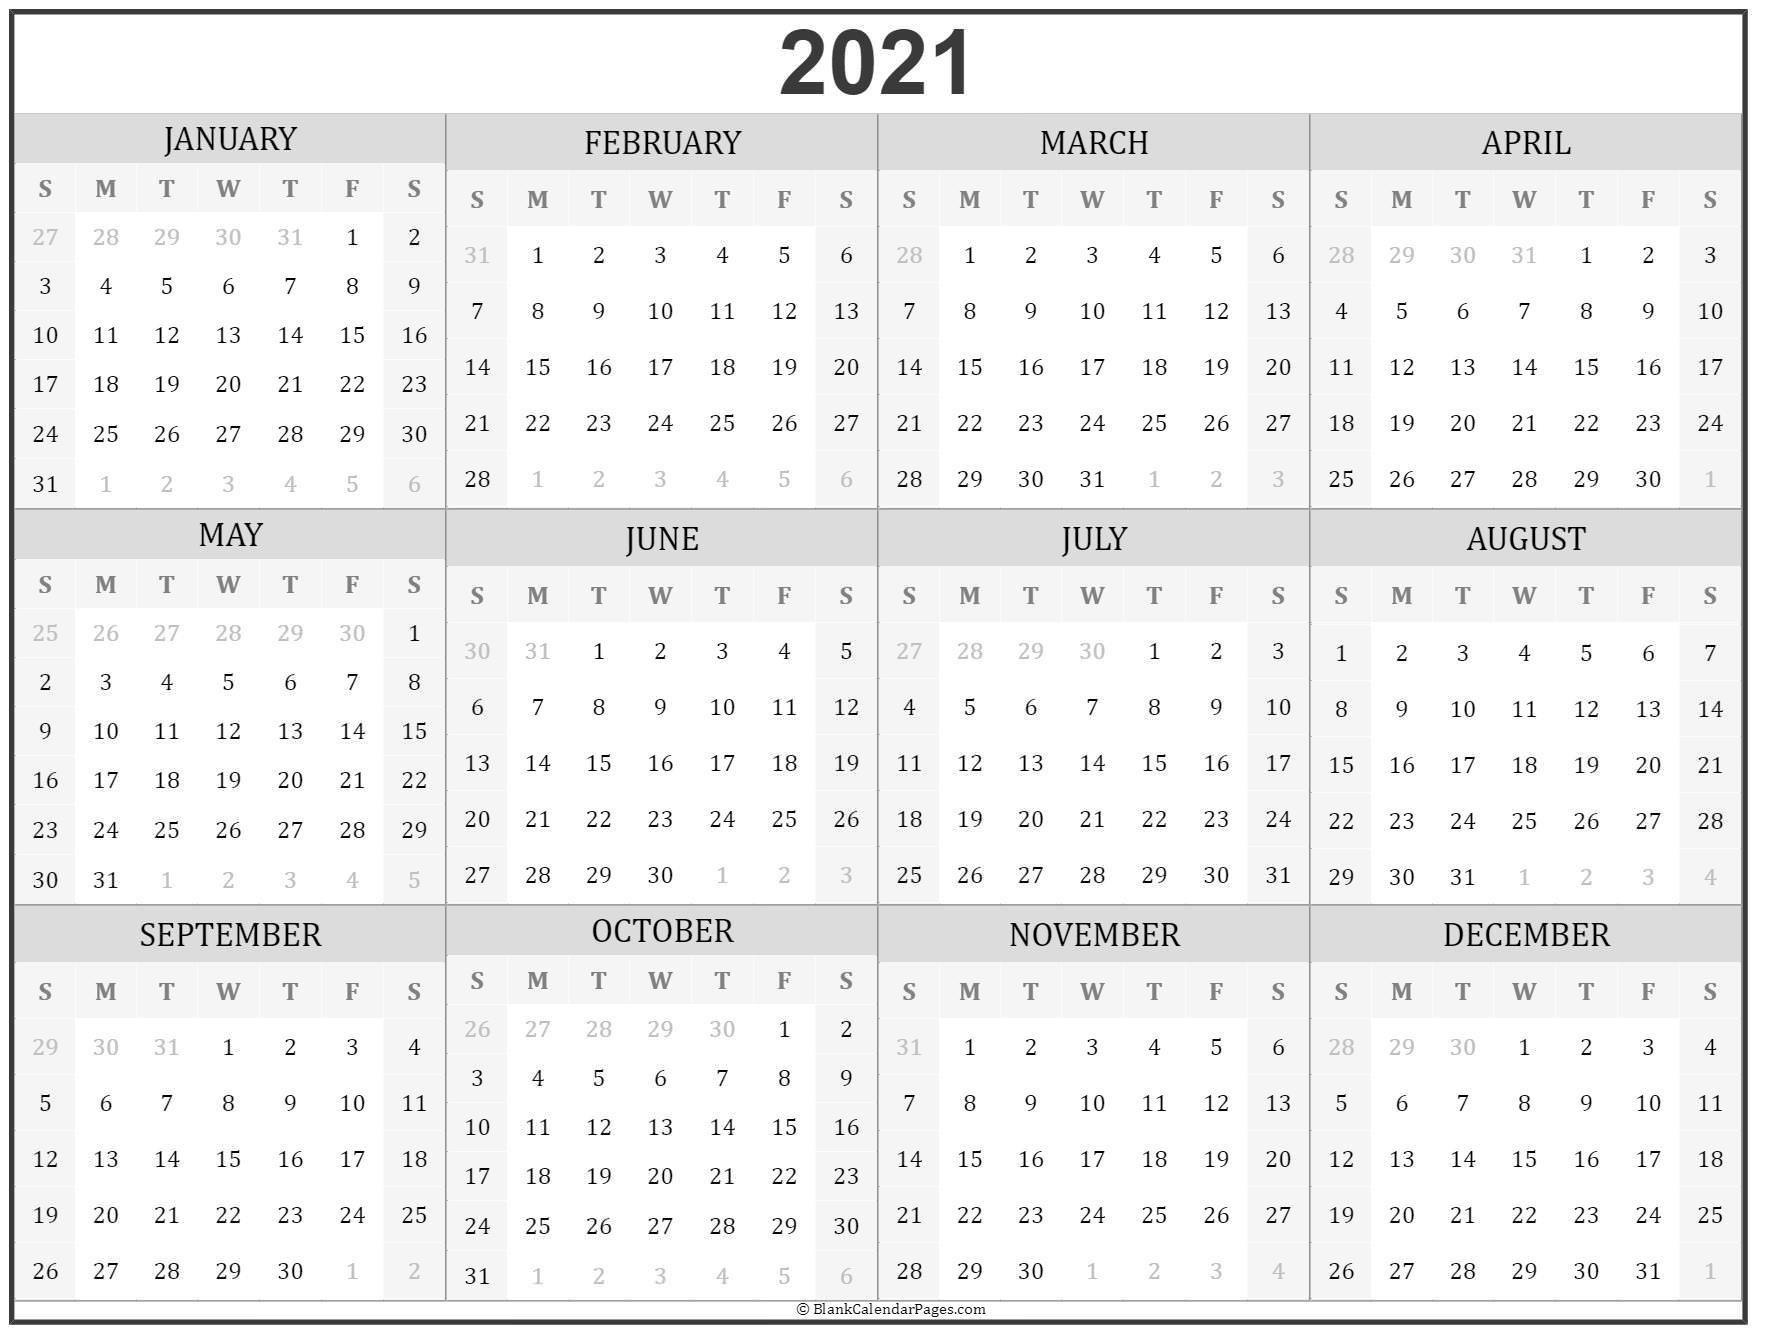 2021 Calendar Print Out Full Months   Free Printable